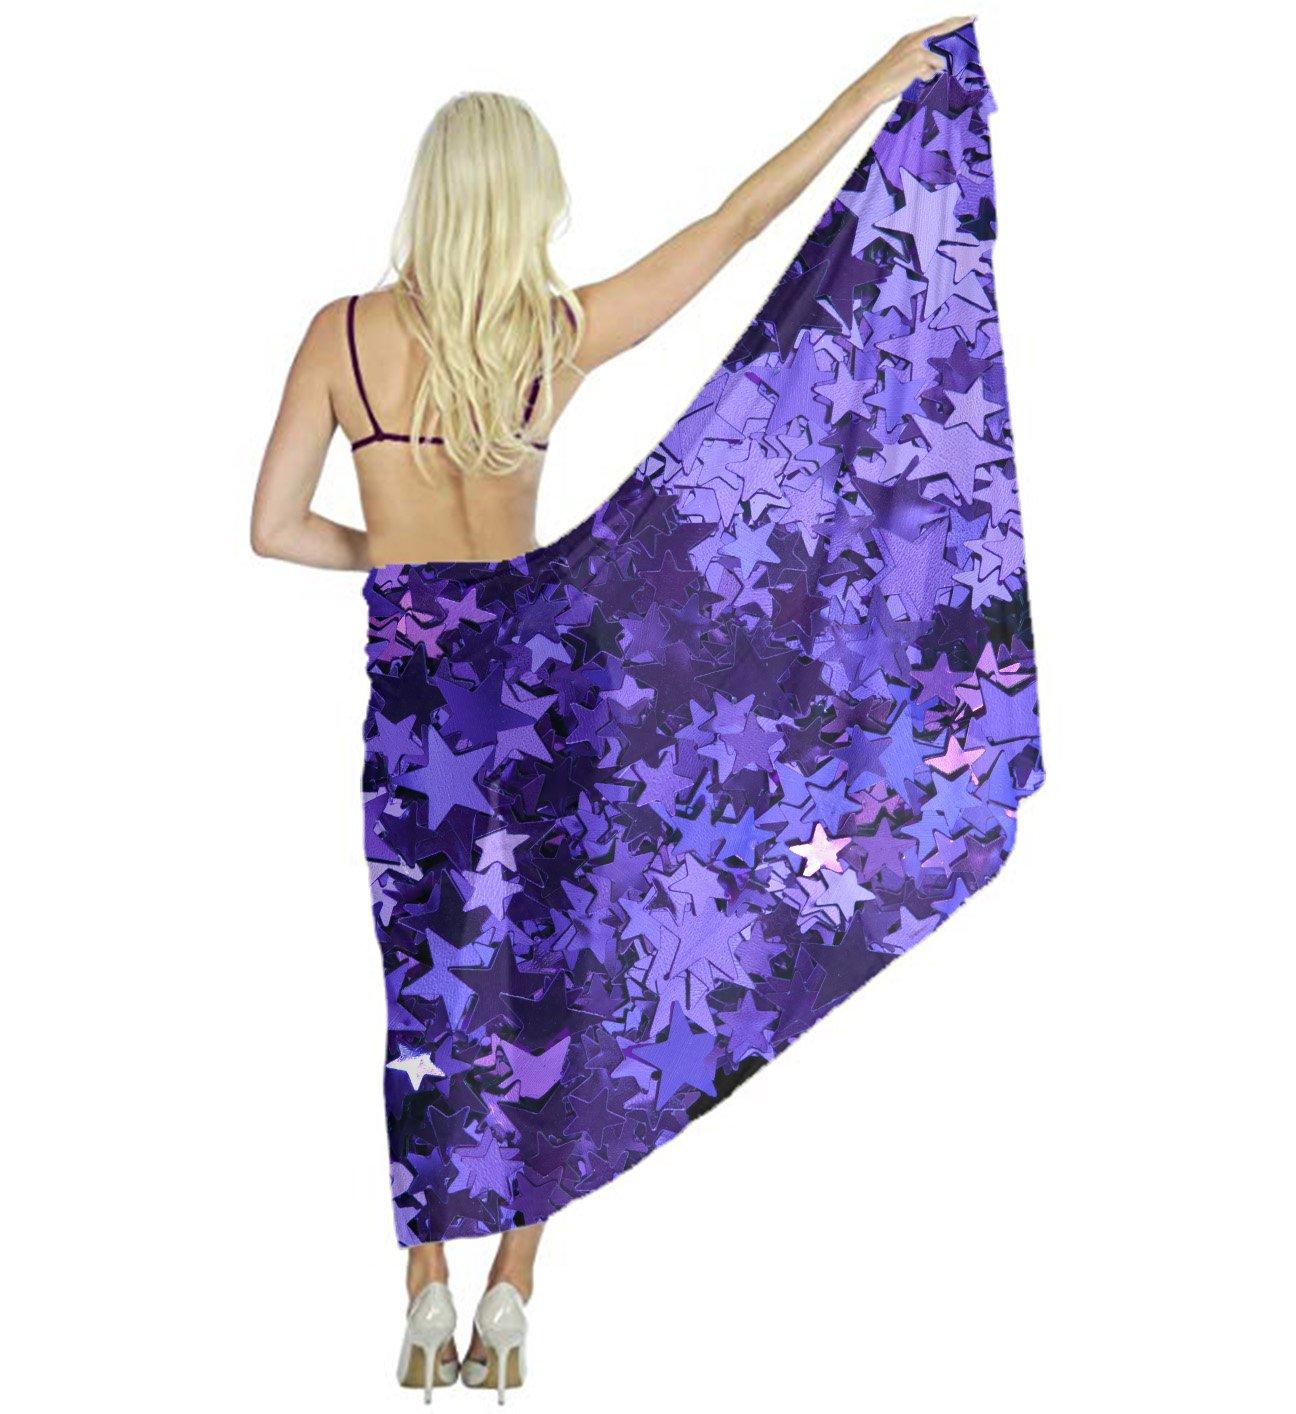 Women Large Soft Shawl, Purple_Foil_Stars Desert Scarf Wrap, Dress Silk Shawl